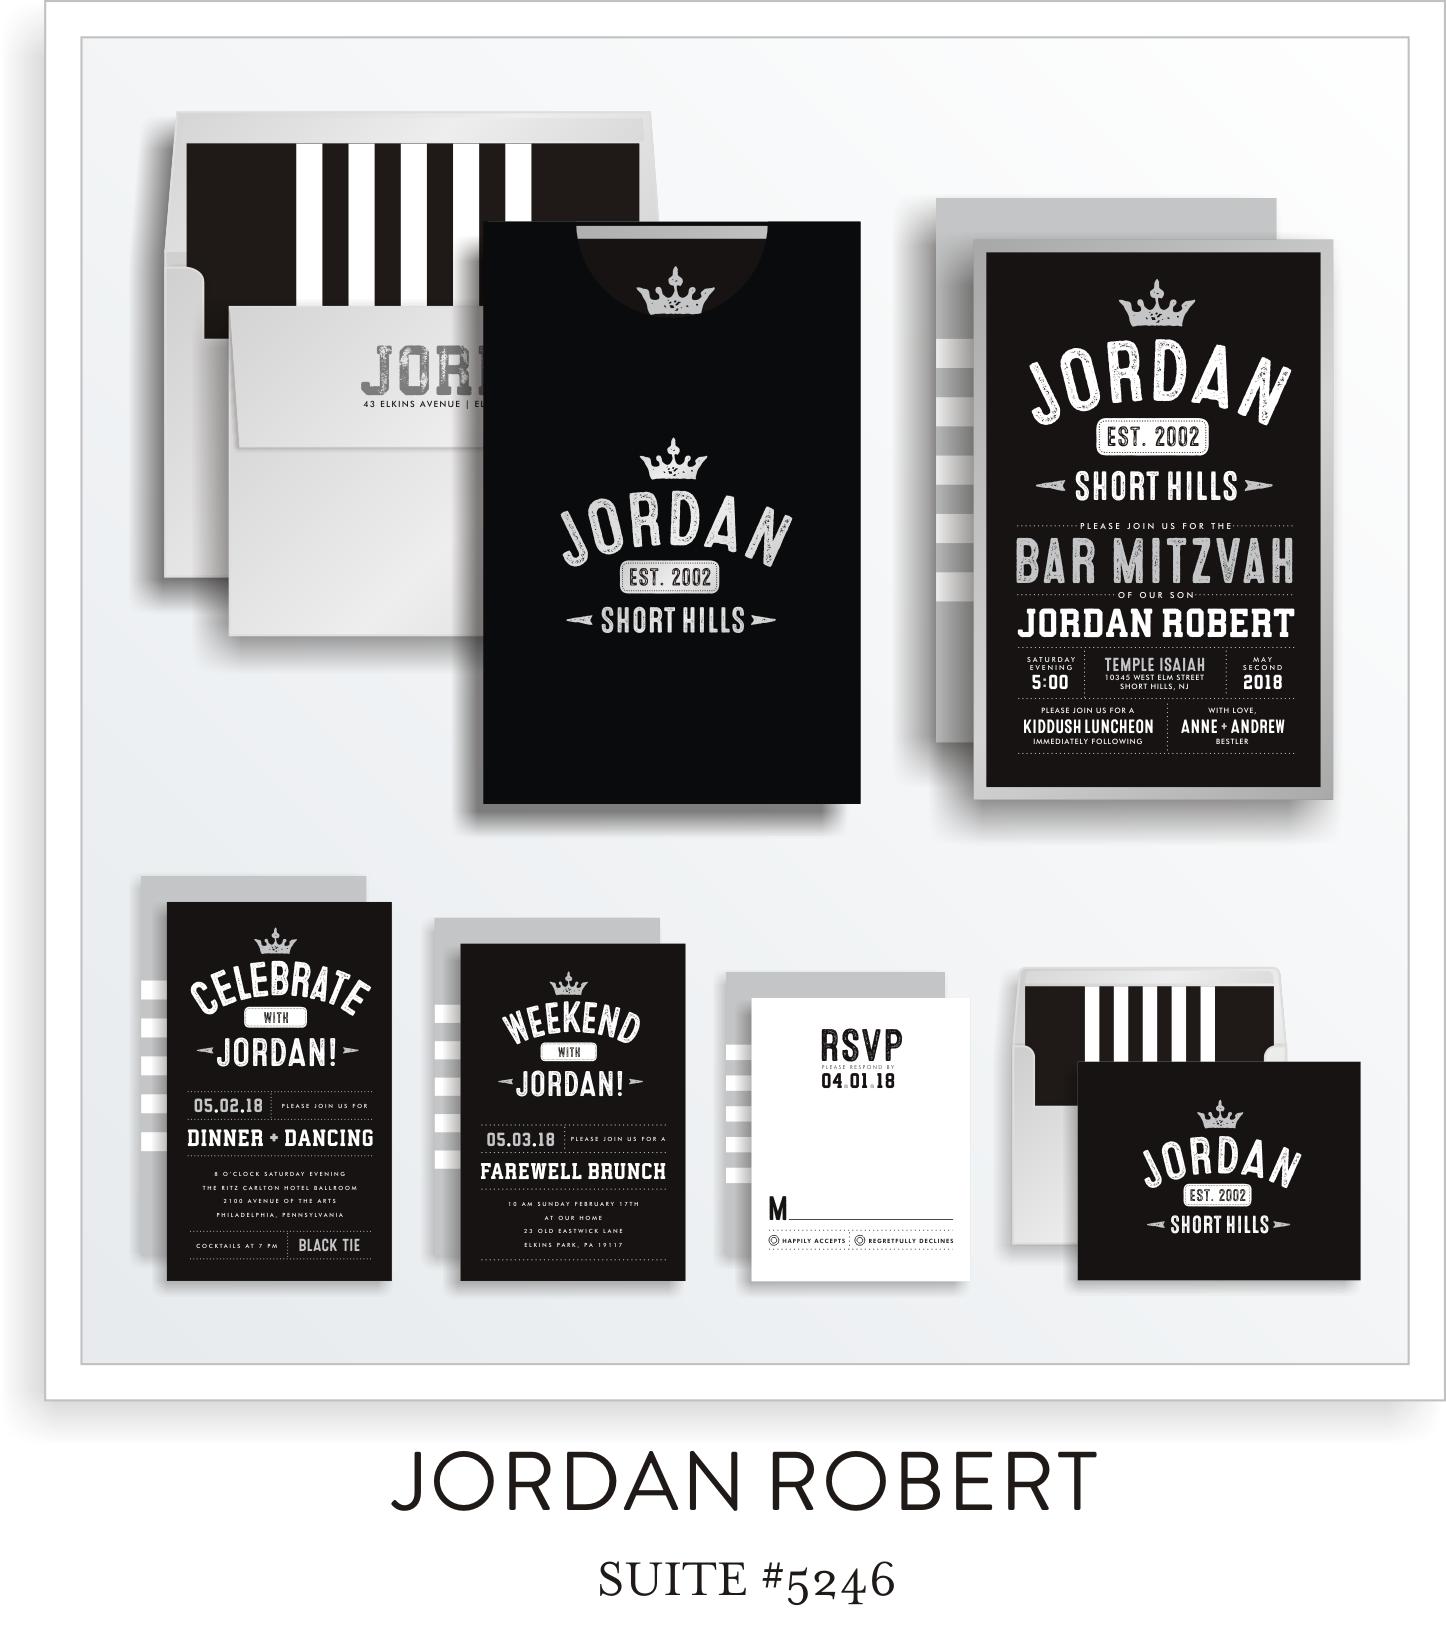 Copy of Copy of Bar Mitzvah Invitation Suite 5246 - Jordan Robert